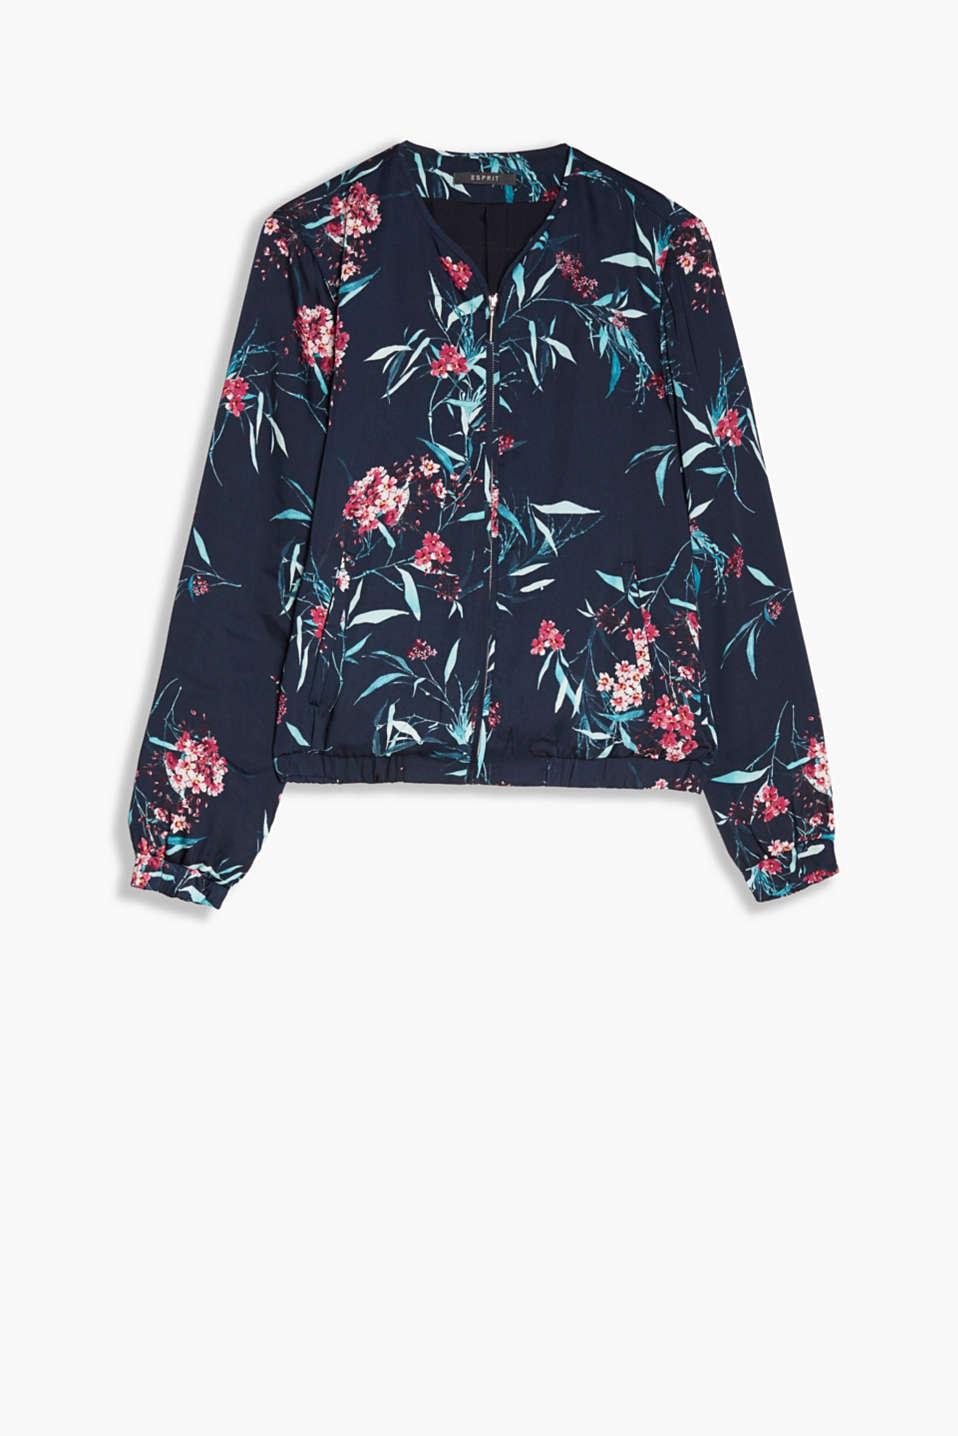 esprit floral bedruckte bomberjacke aus satin im online shop kaufen. Black Bedroom Furniture Sets. Home Design Ideas